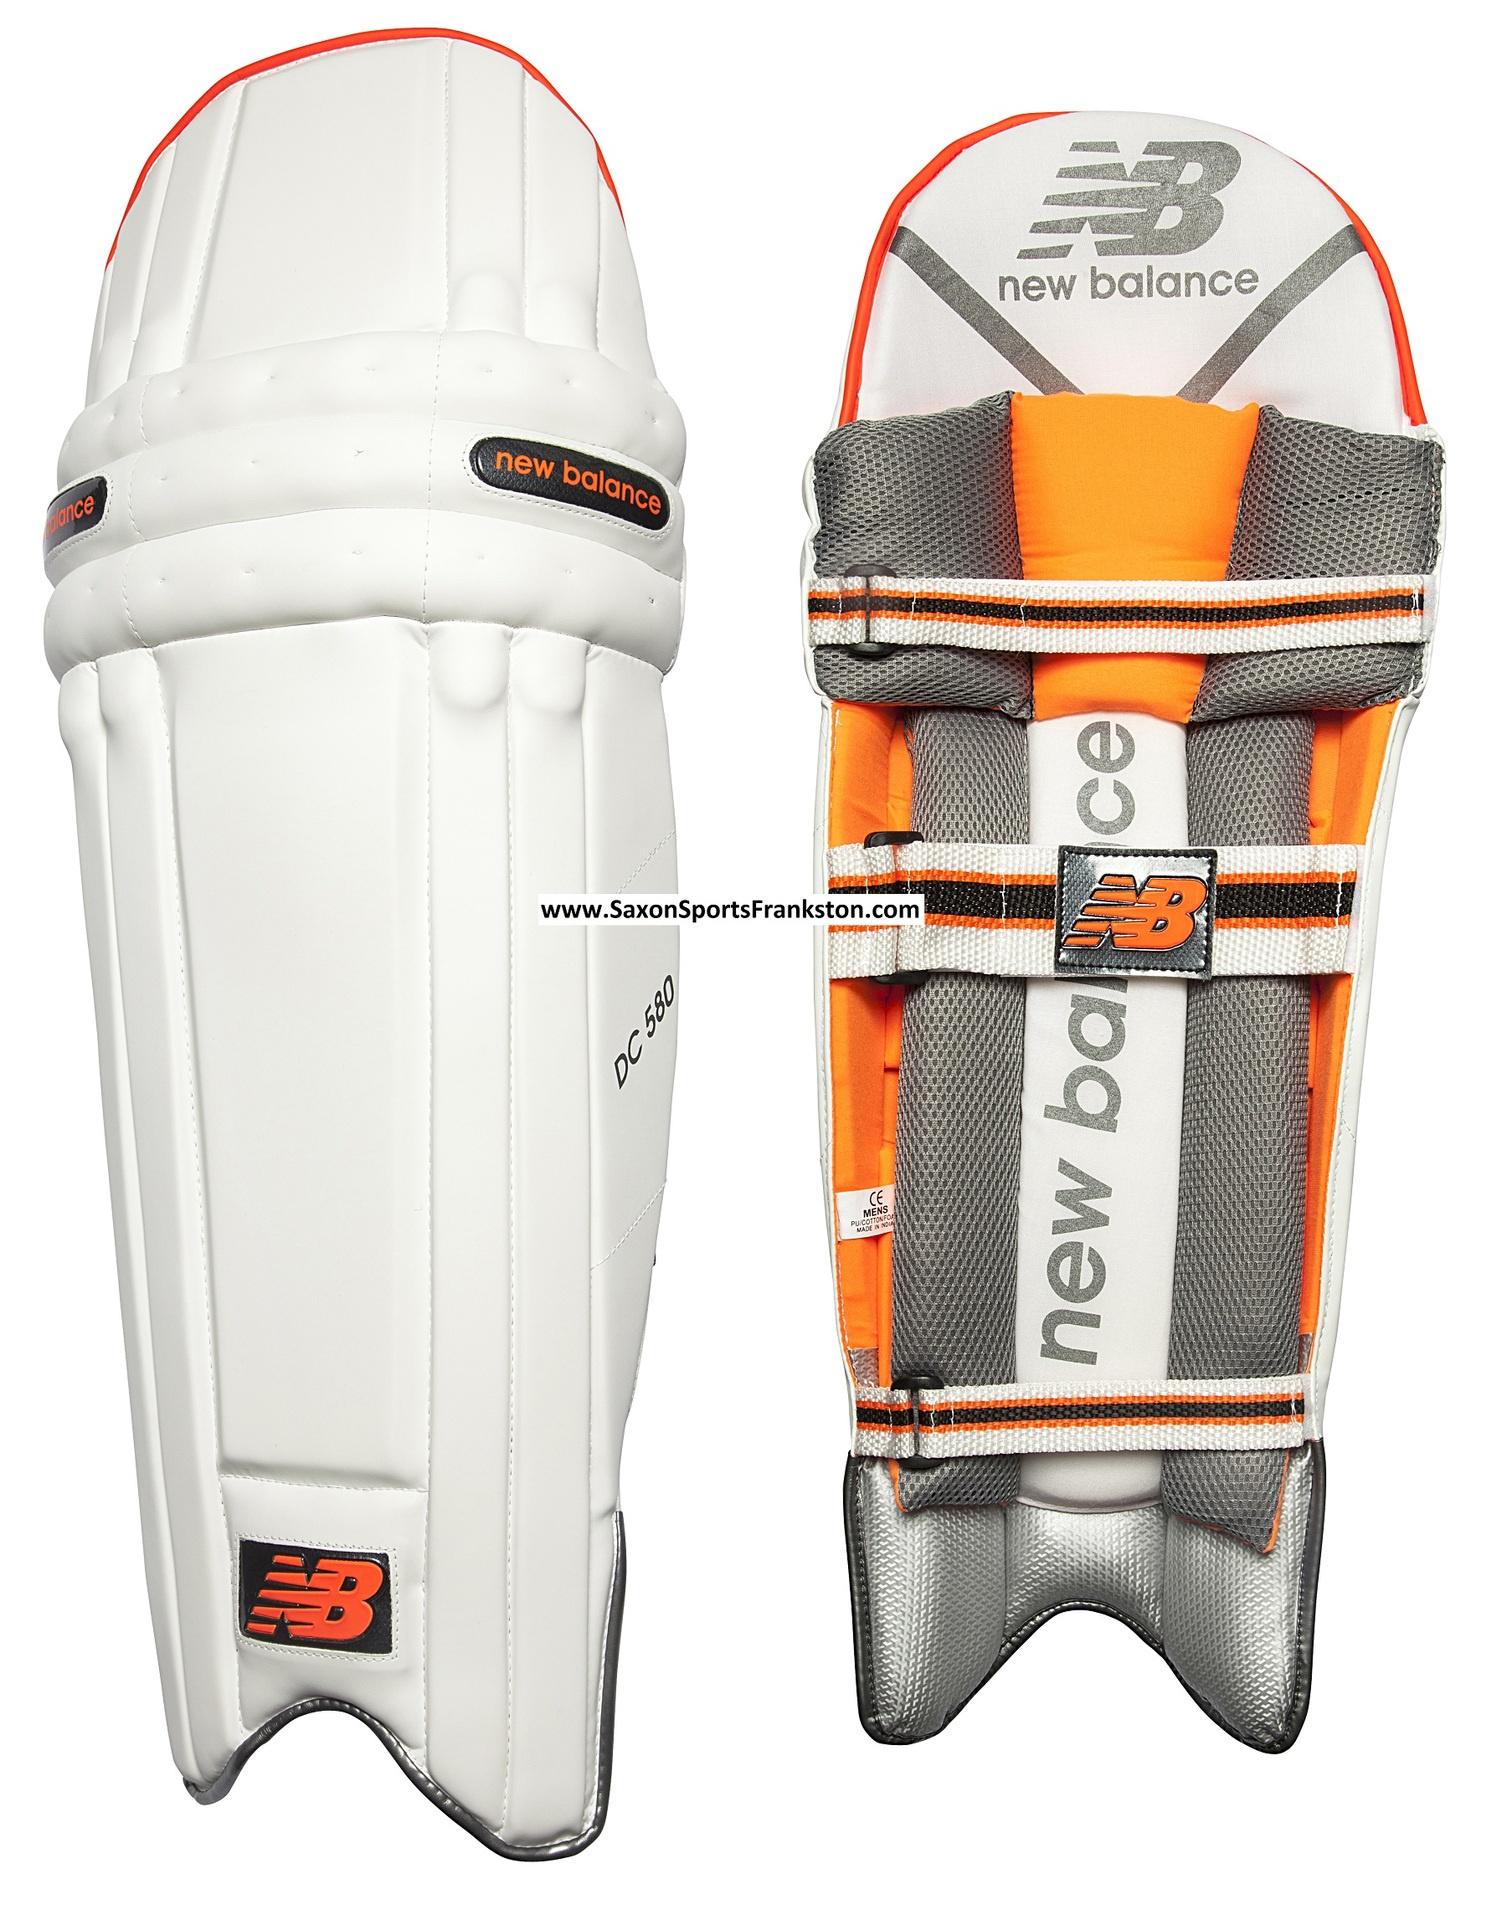 new balance dc 580 cricket gloves